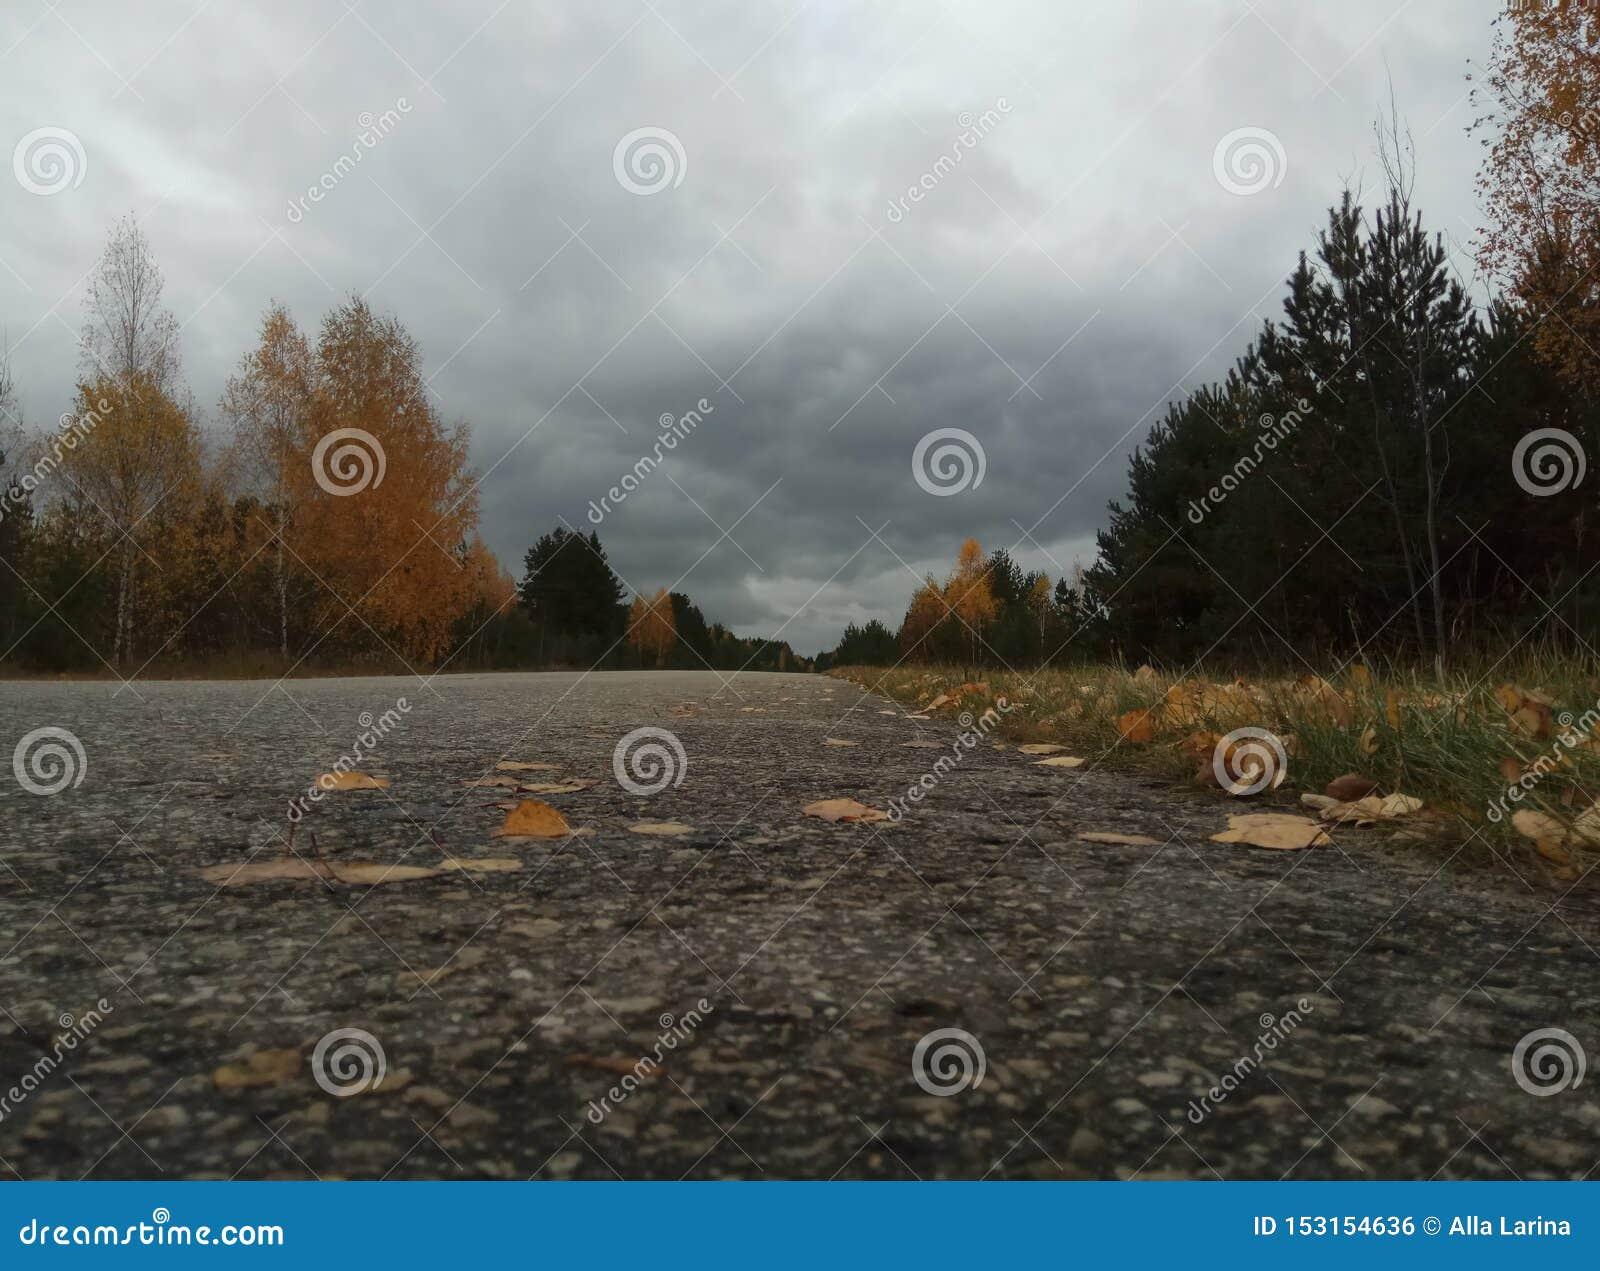 O δασικό τοπίο Μπλε ουρανός και δέντρα με το κίτρινο φύλλο και κανένα φύλλο Ορίζοντας φυσικό υπόβαθρο της Ρωσίας